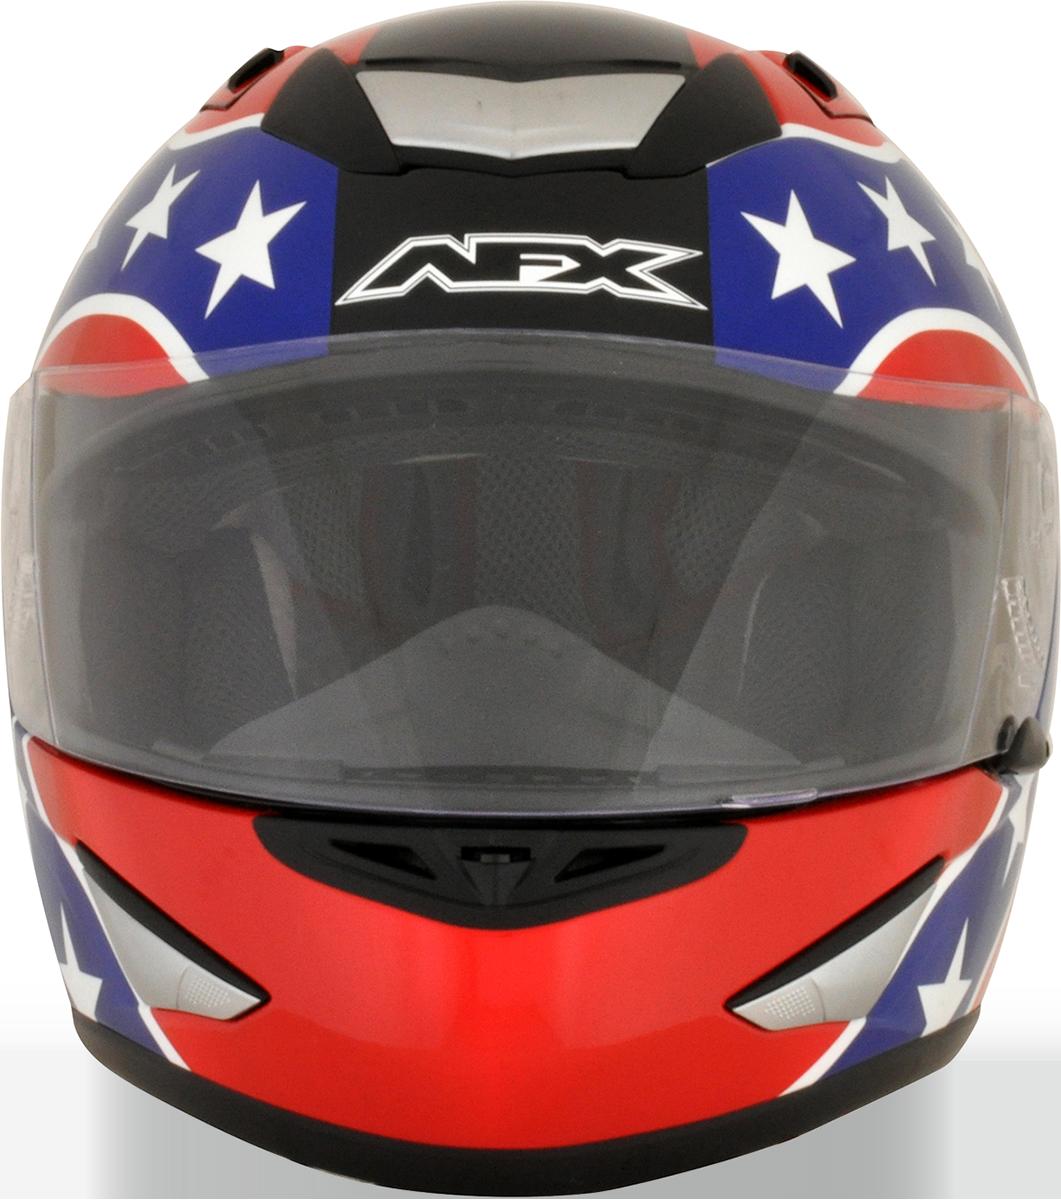 Racing helmet png. Afx red unisex rebel